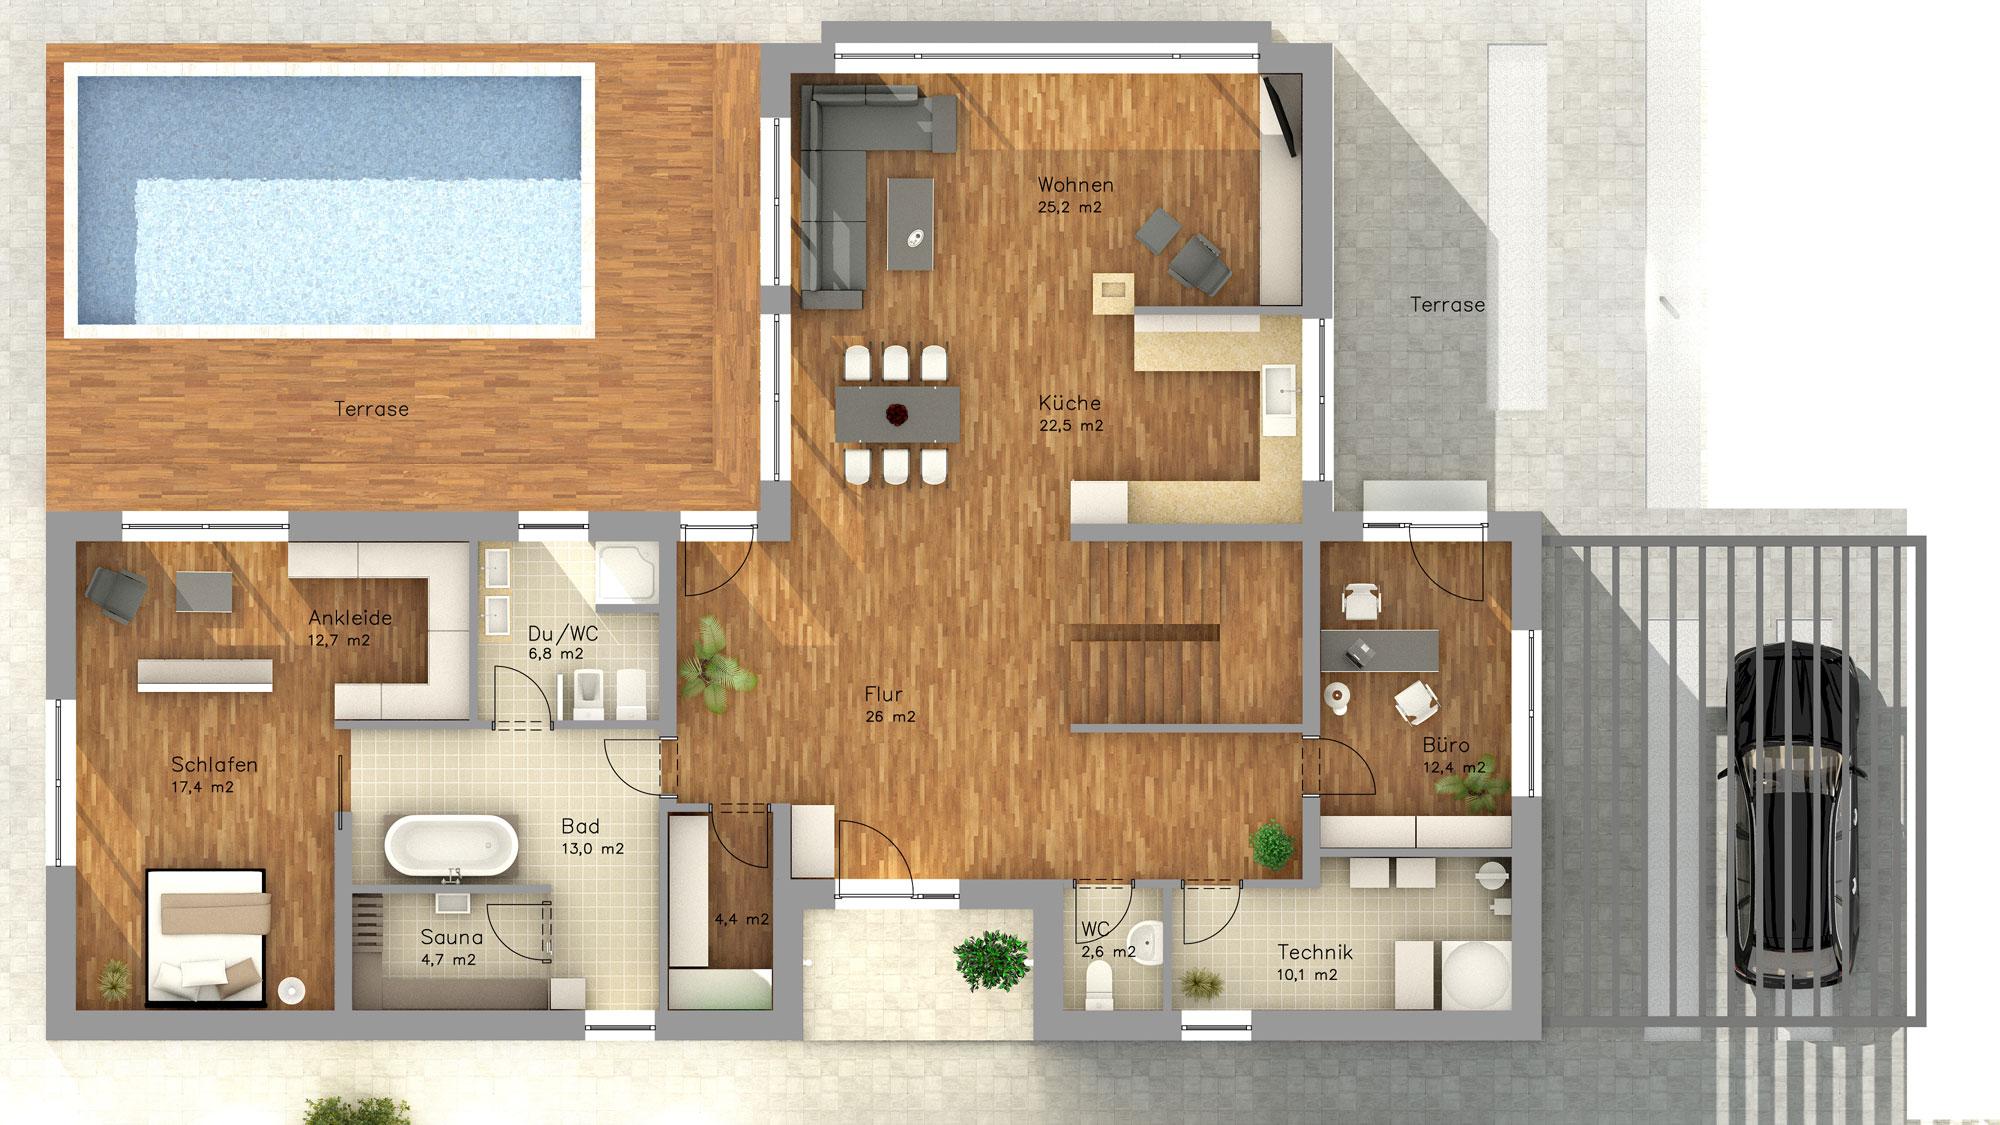 http://renderthing.ro/wp-content/uploads/2014/06/Planuri-Randari-3D-Vizualizari-Arhitecturale-Plan-Locuinta-Unifamiliala-Wien-3-Renderthing.jpg